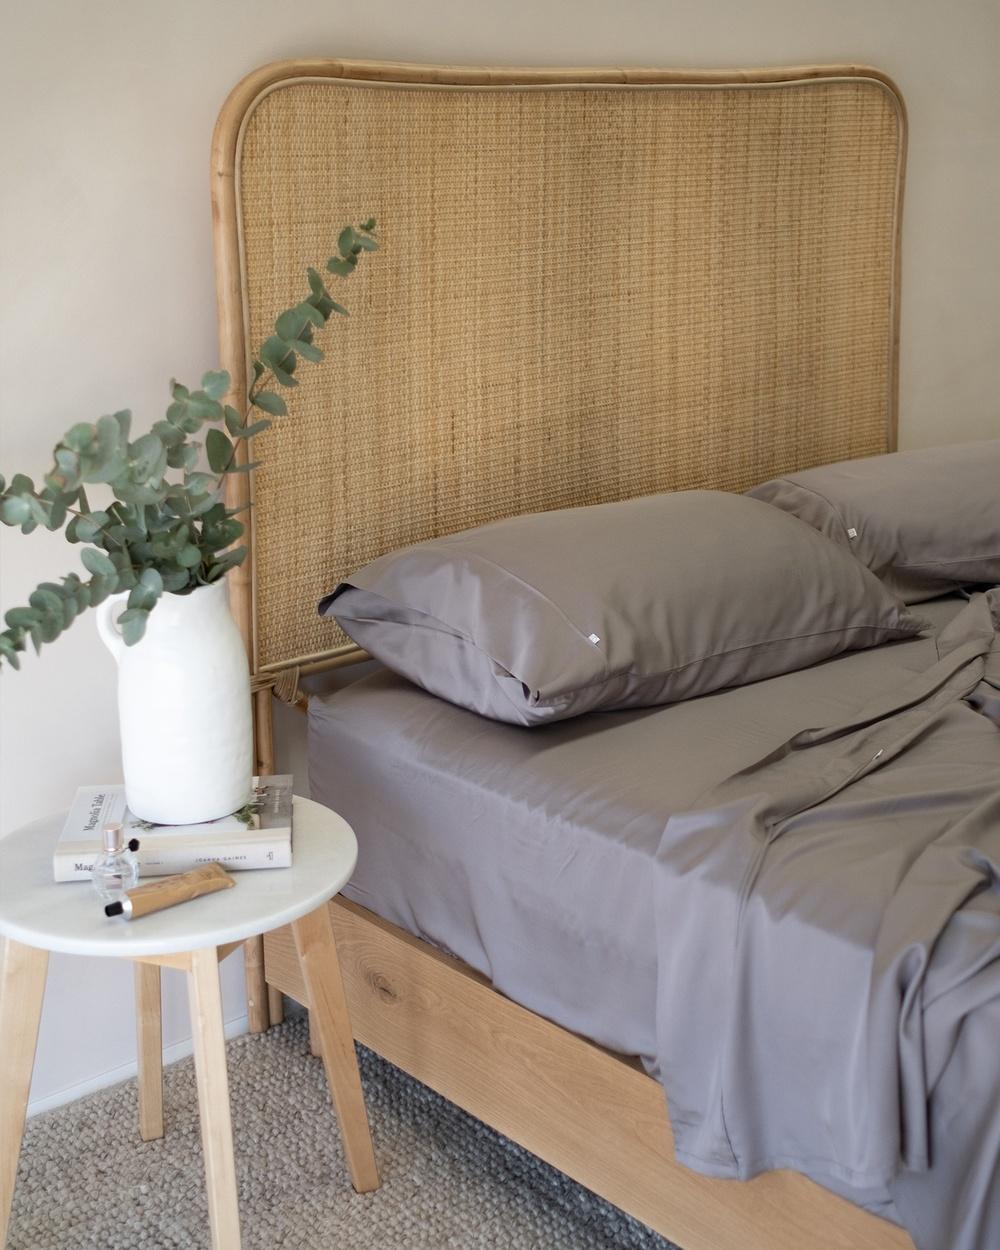 Mulberry Threads 100% Organic Bamboo Sheet Set Home Grey Australia